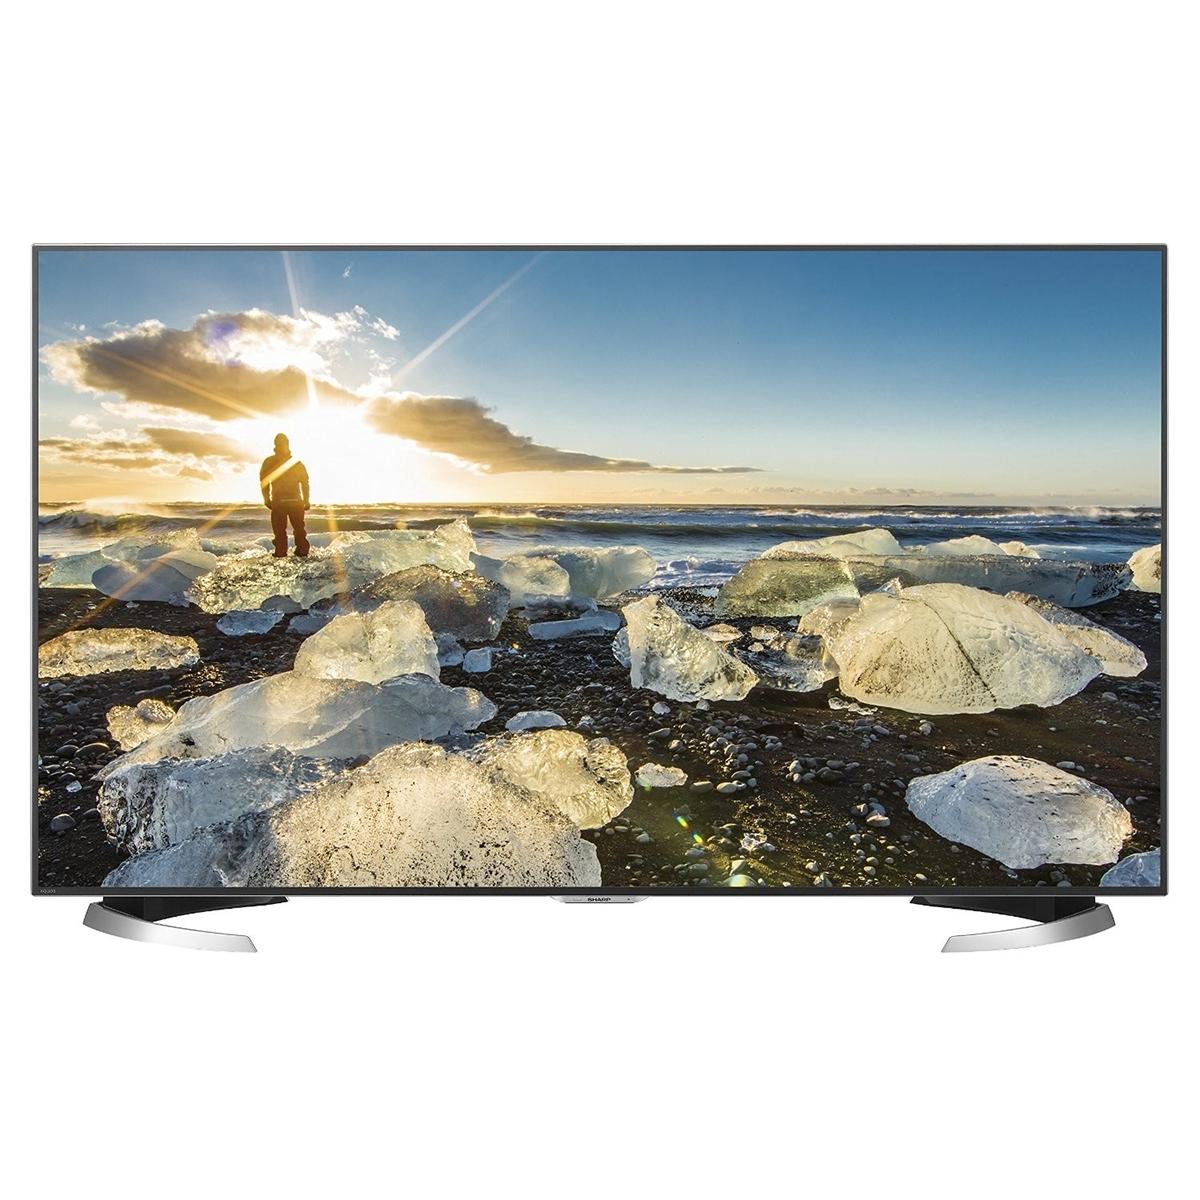 Sharp AQUOS 70inch LED 4K Ultra HDTV - LC-70UD27U